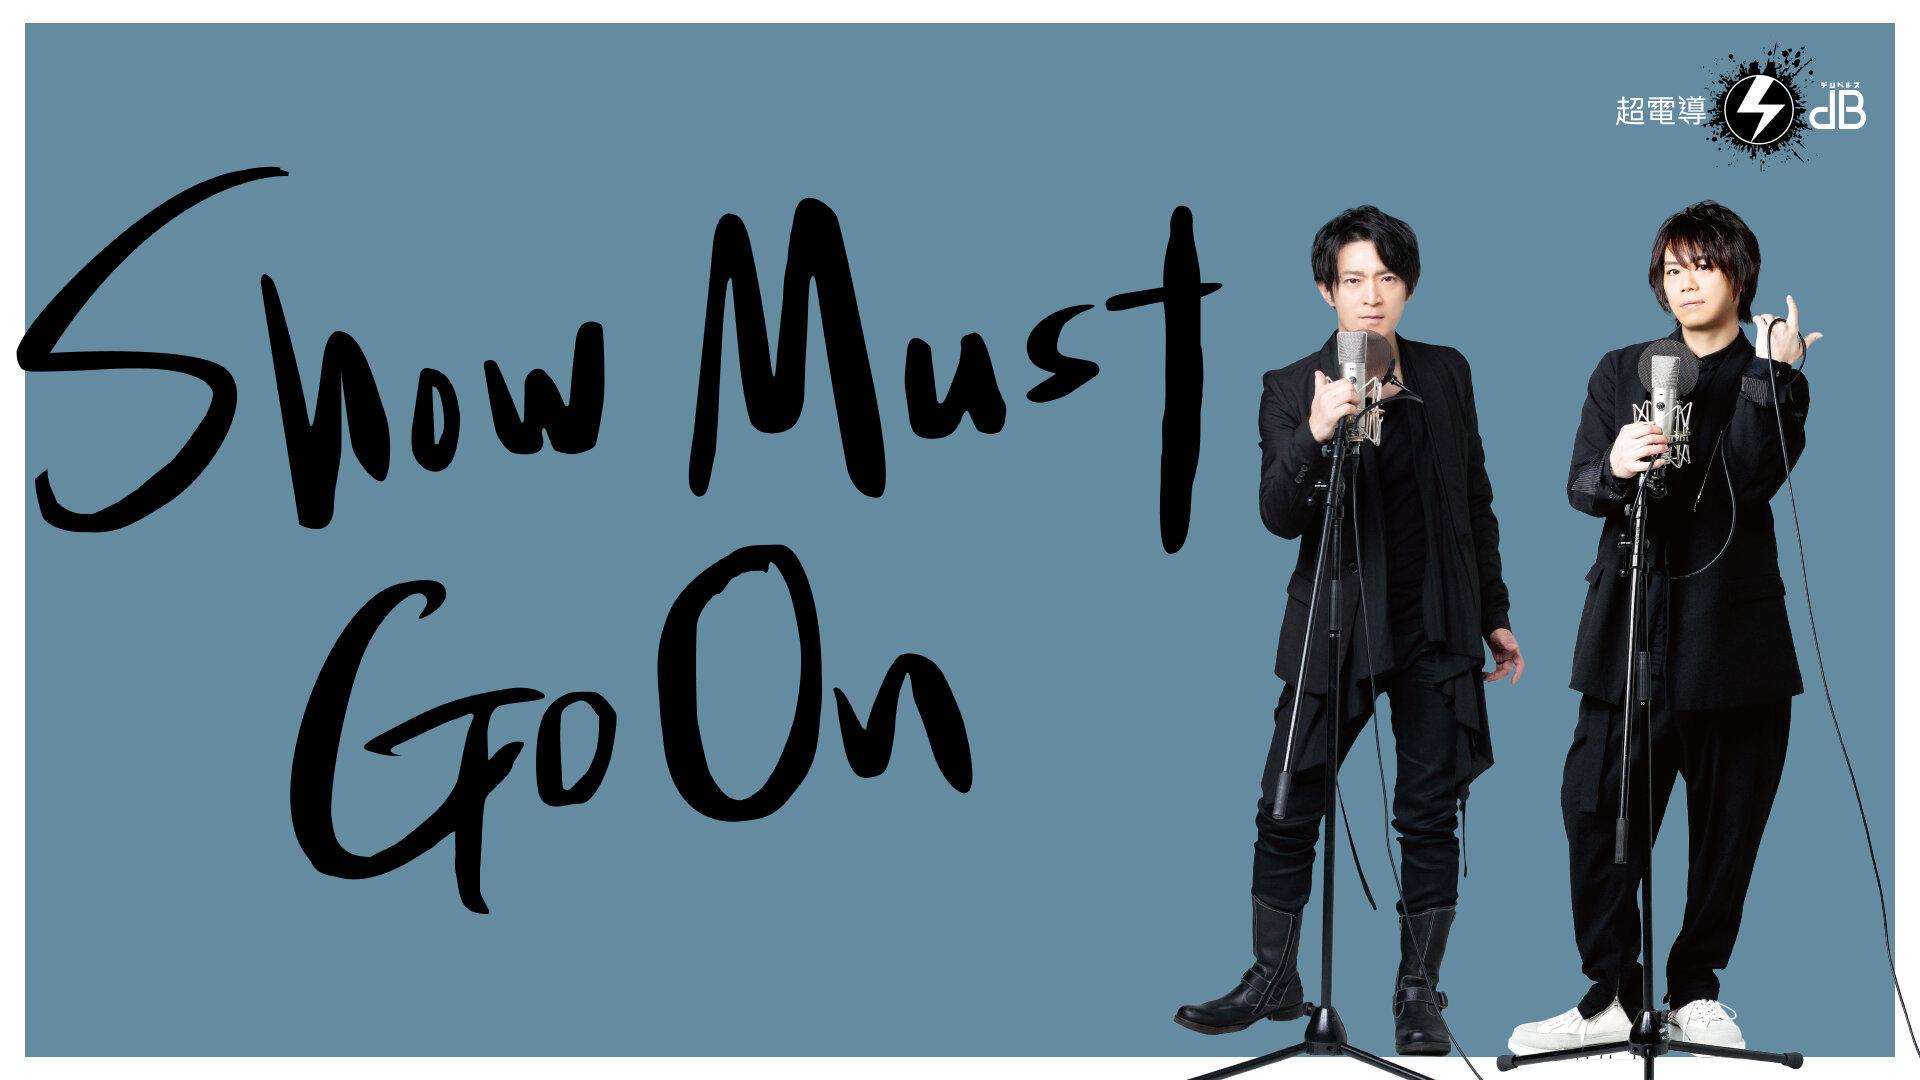 「SHOW MUST GO ON」(9月14日 夜・東京公演)(dアニメストア)